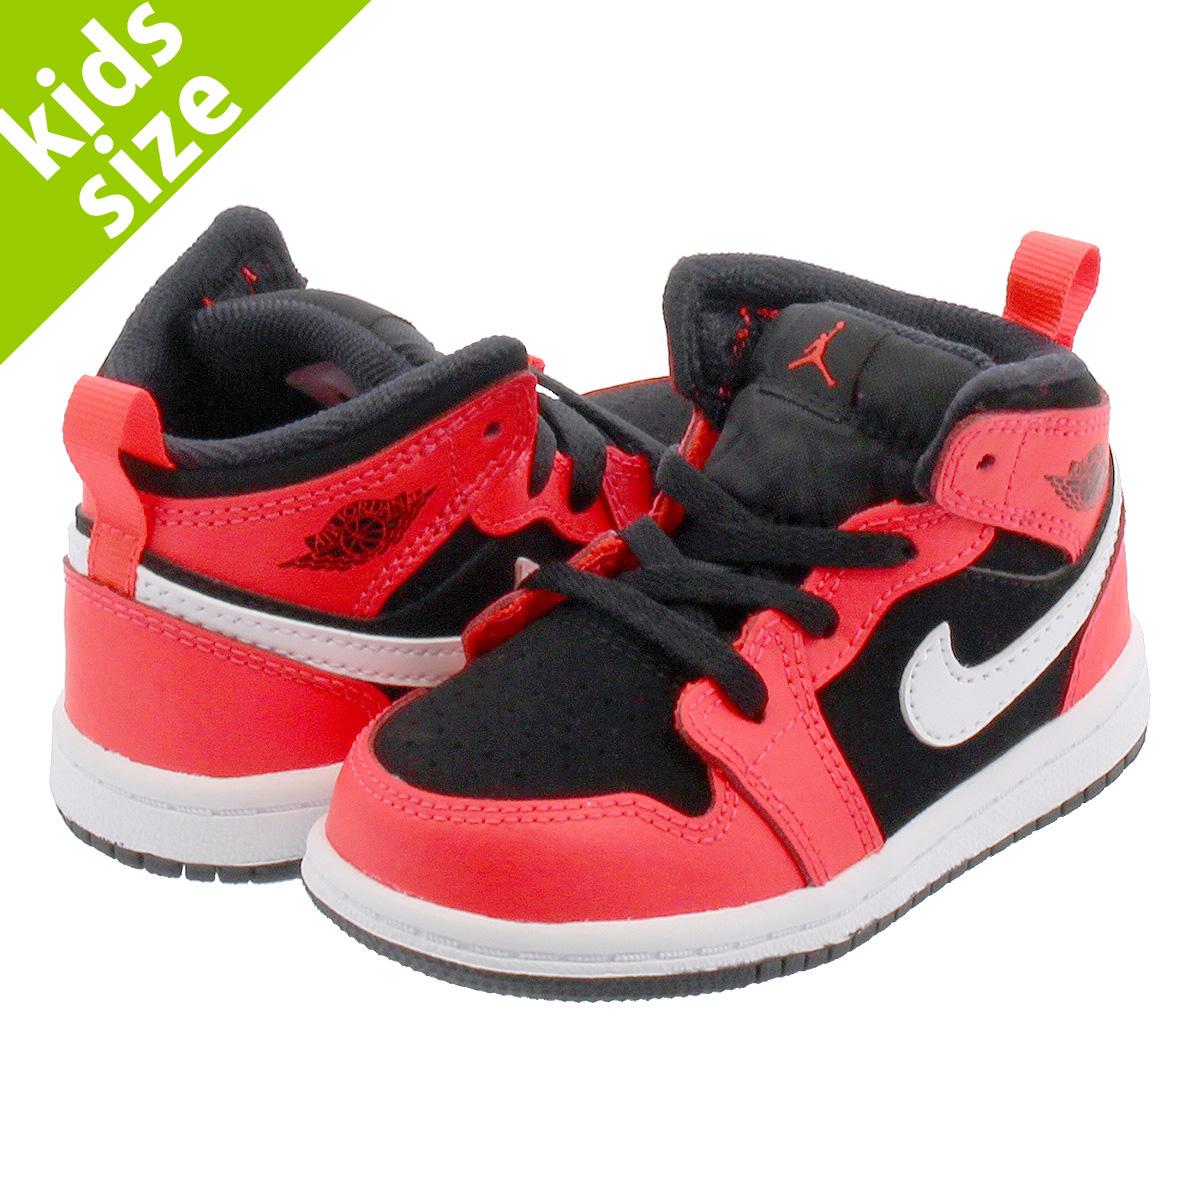 0253d8cf2e5f71 NIKE AIR JORDAN 1 MID BT Nike Air Jordan 1 mid BT BLACK INFRARED 23  640